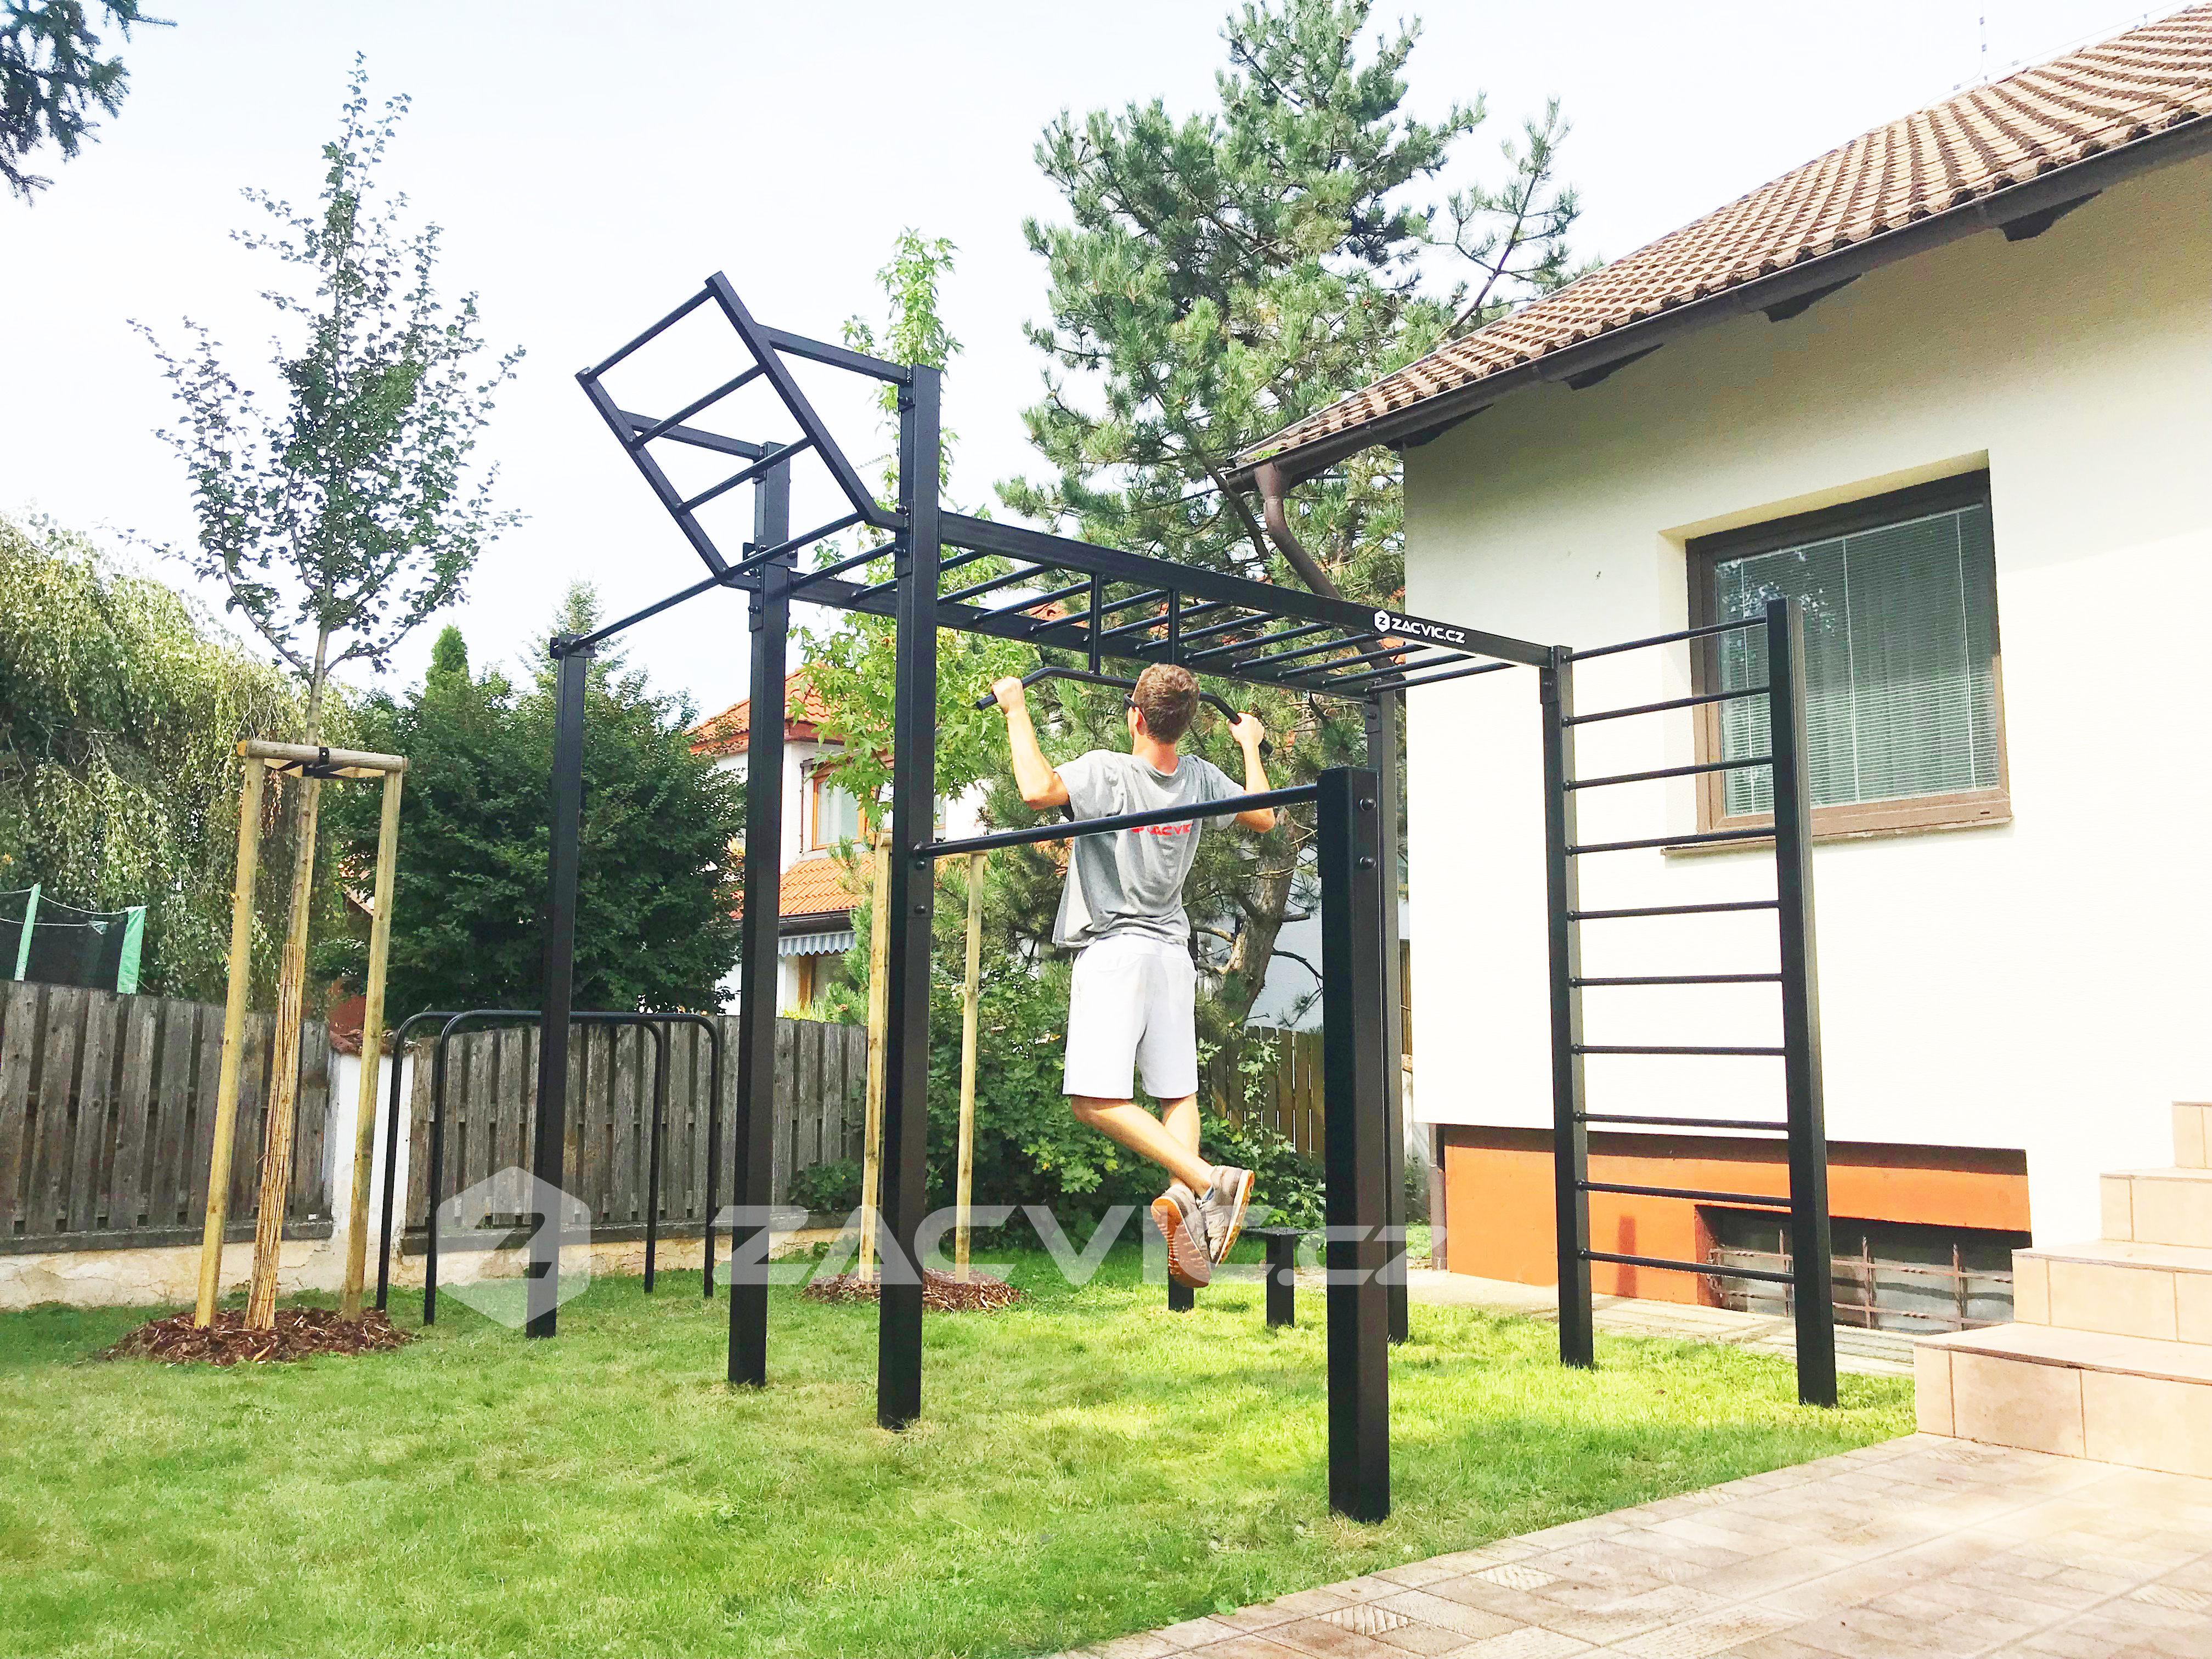 workoutova_hriste